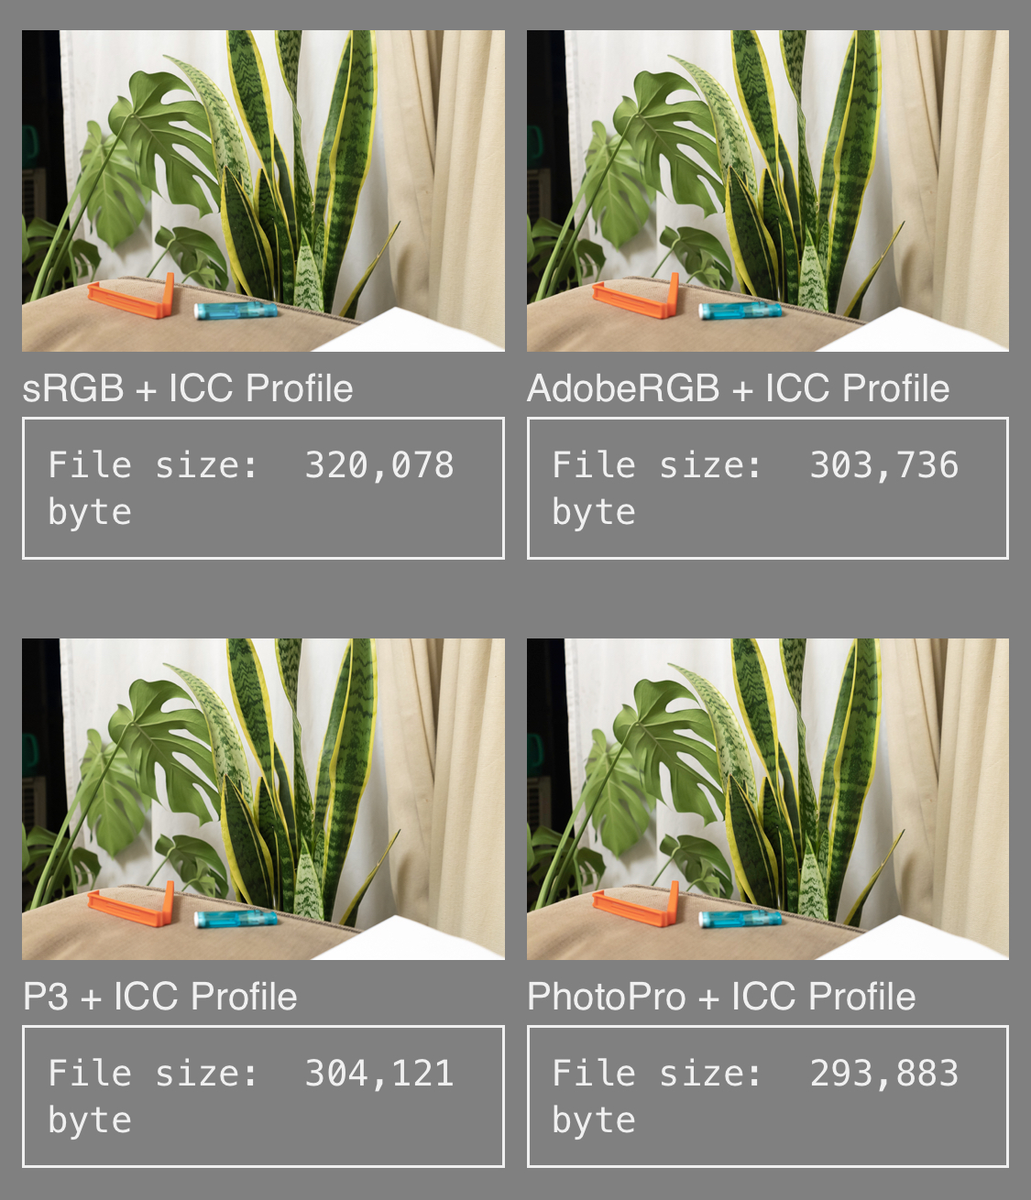 iPhoneでの元のjpg画像の表示